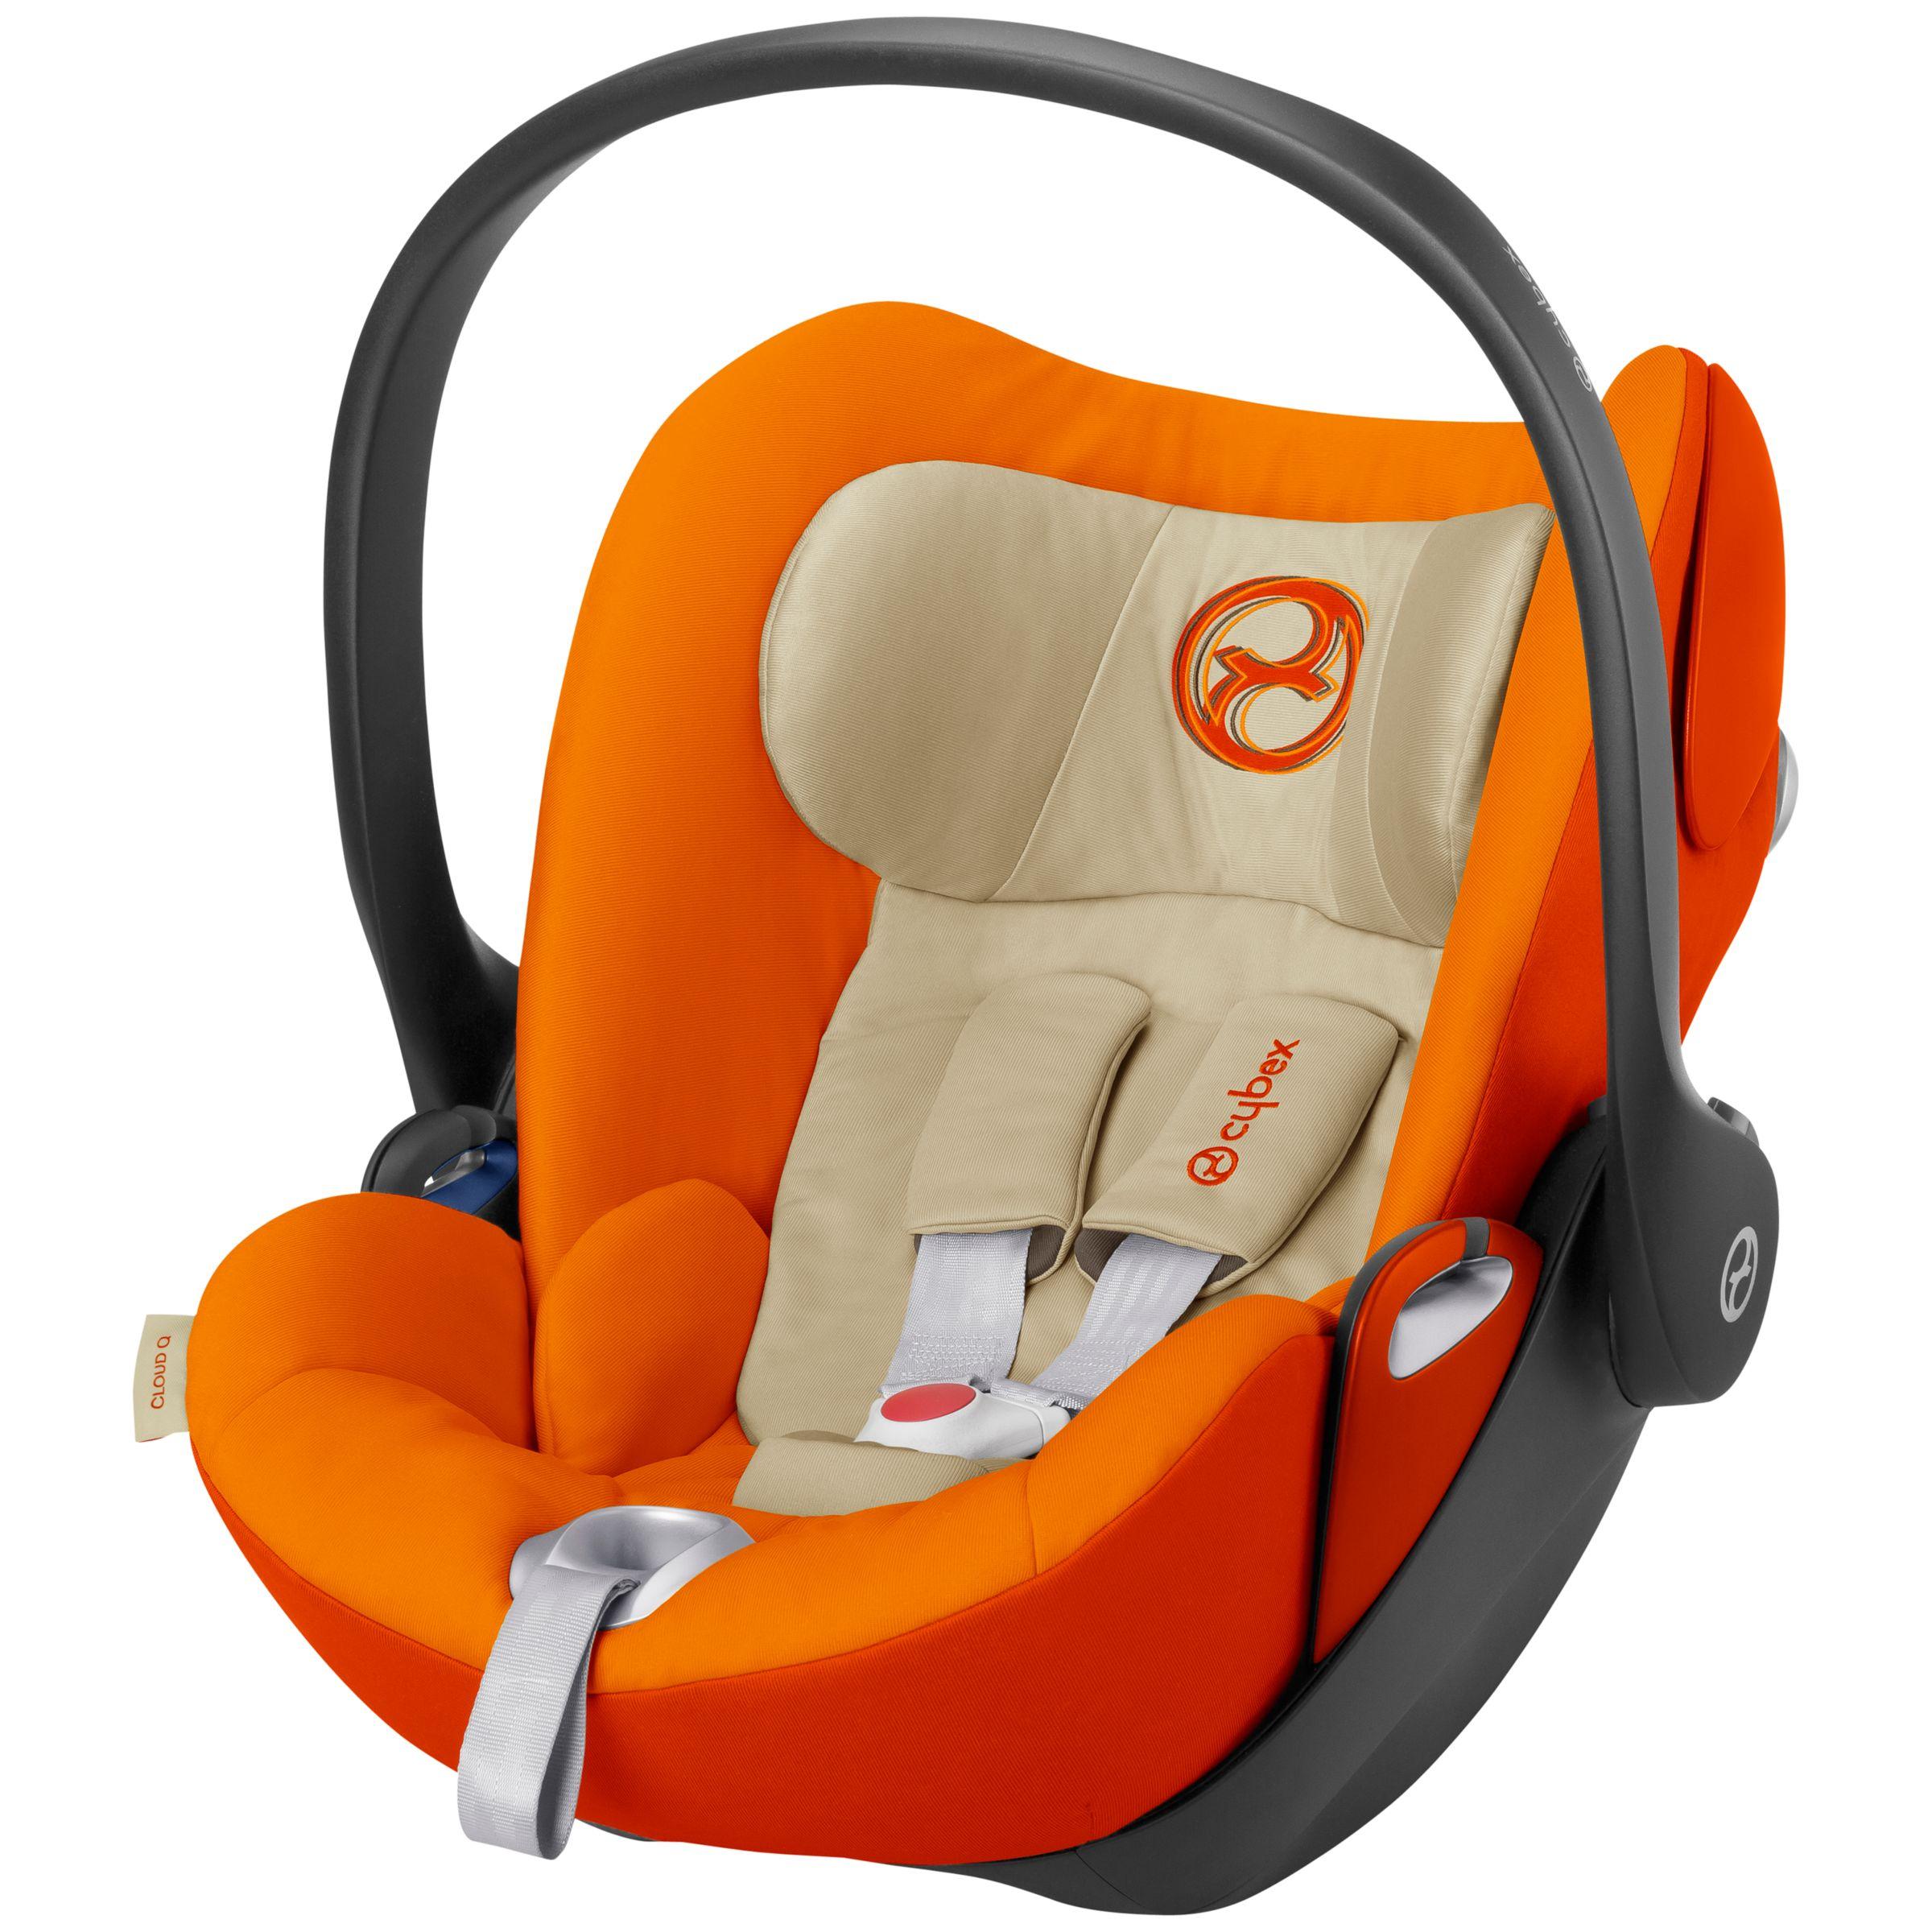 Cybex Cybex Cloud Q Group 0+ Baby Car Seat, Autumn Gold